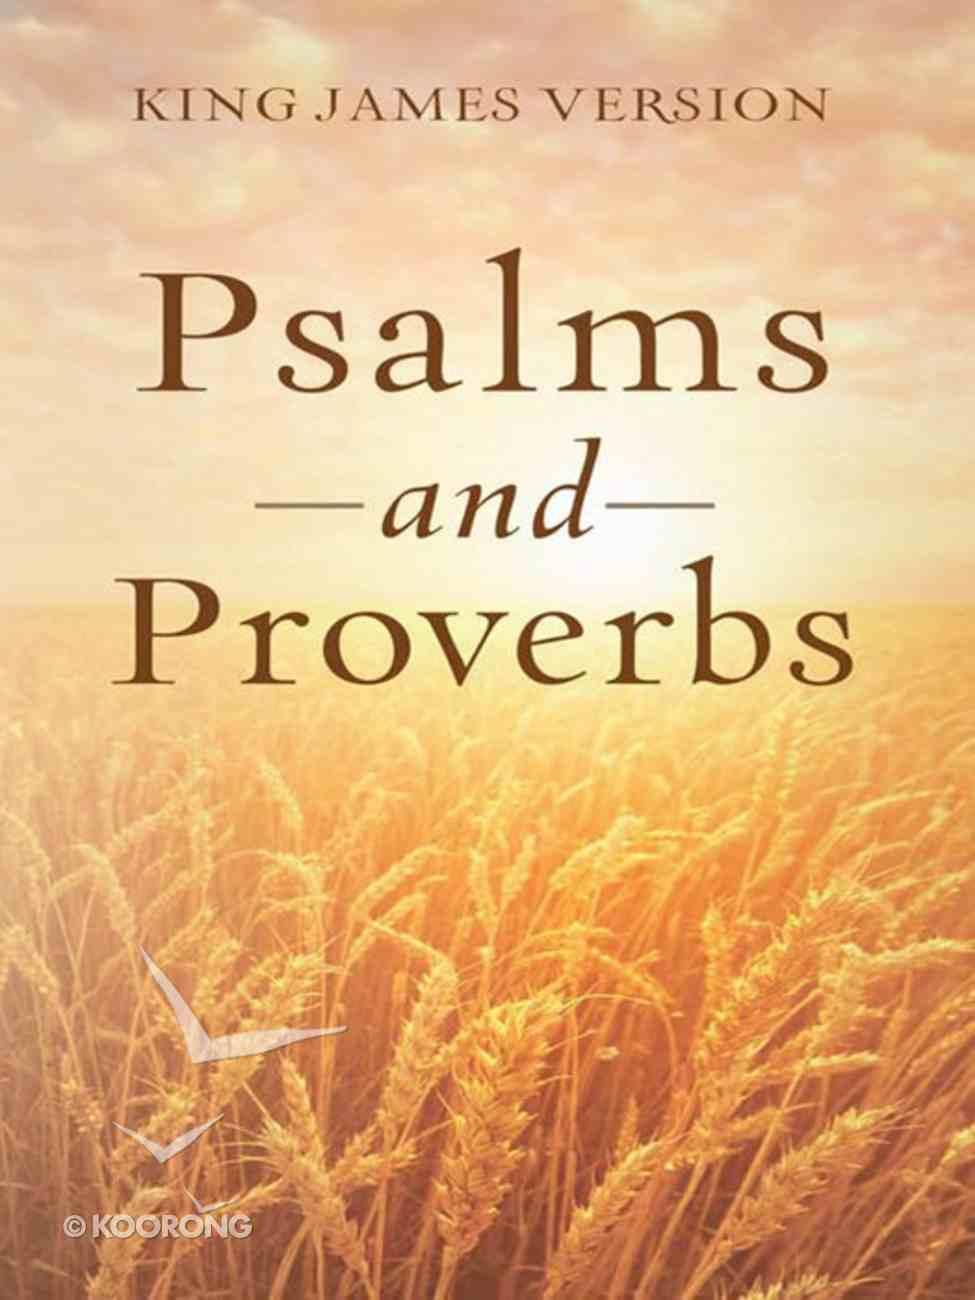 KJV Today's KJV Study Bible eBook